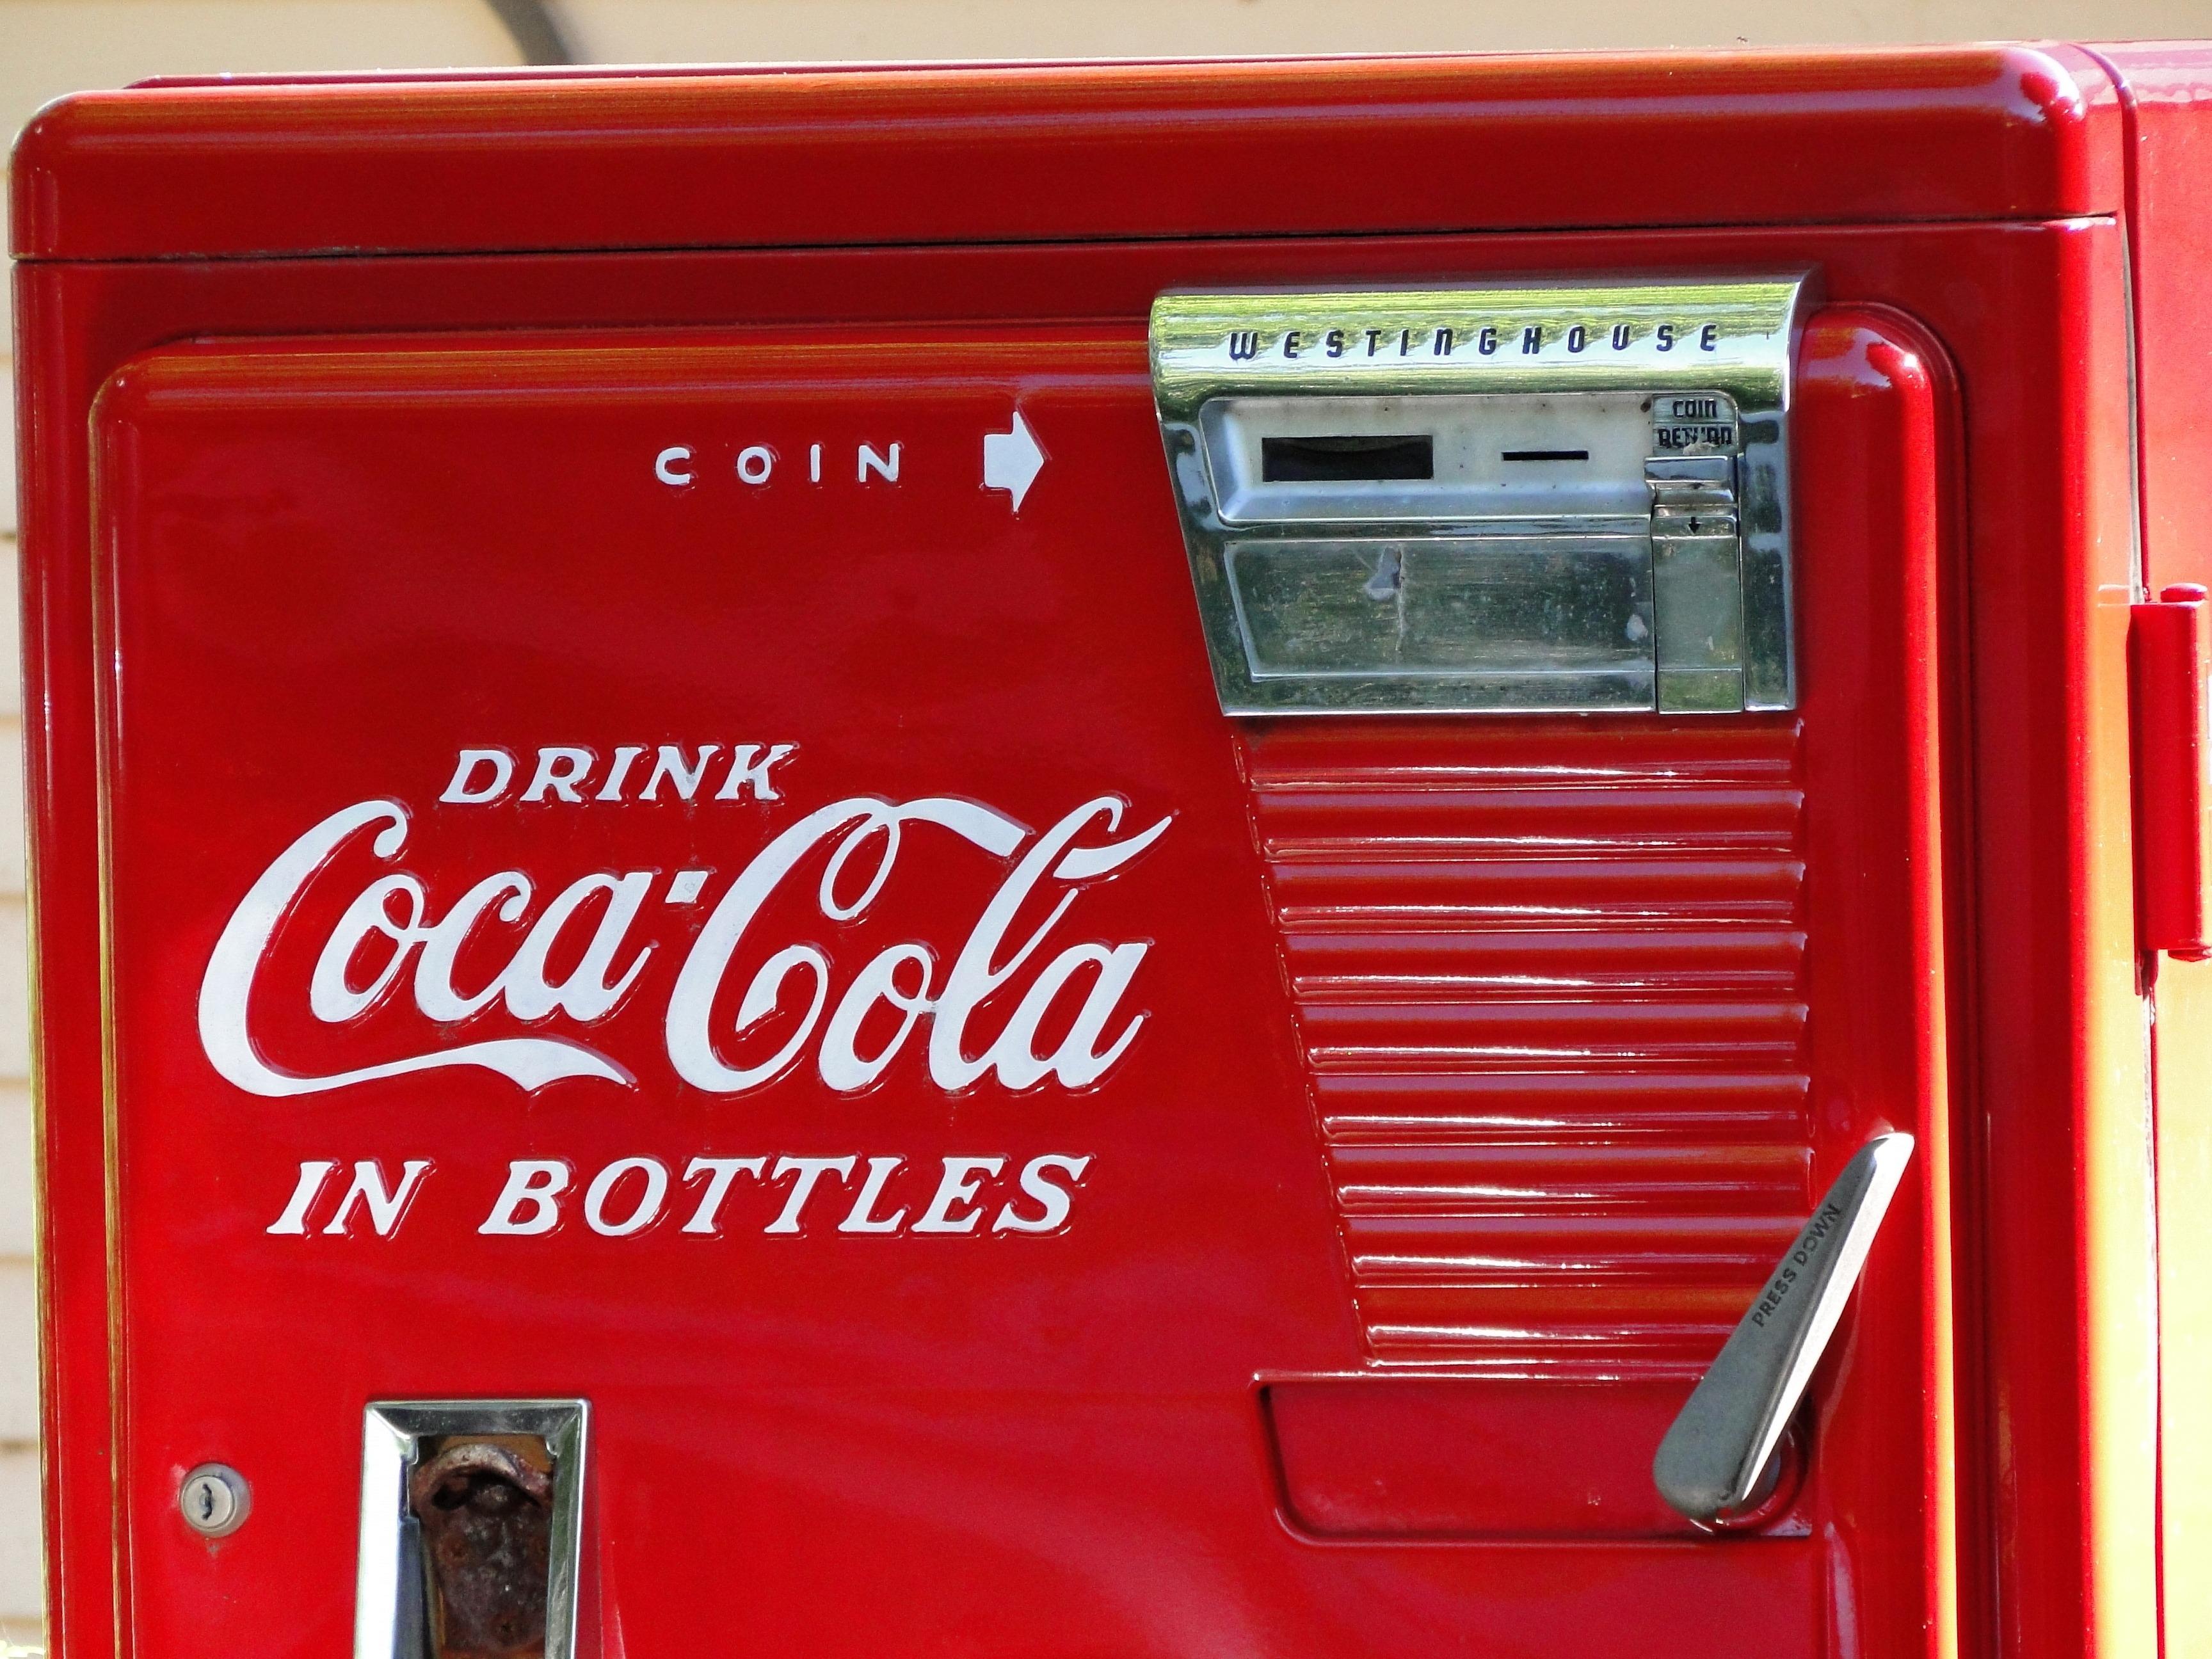 free images vintage retro old red coke machine coca cola classic company soft drink. Black Bedroom Furniture Sets. Home Design Ideas